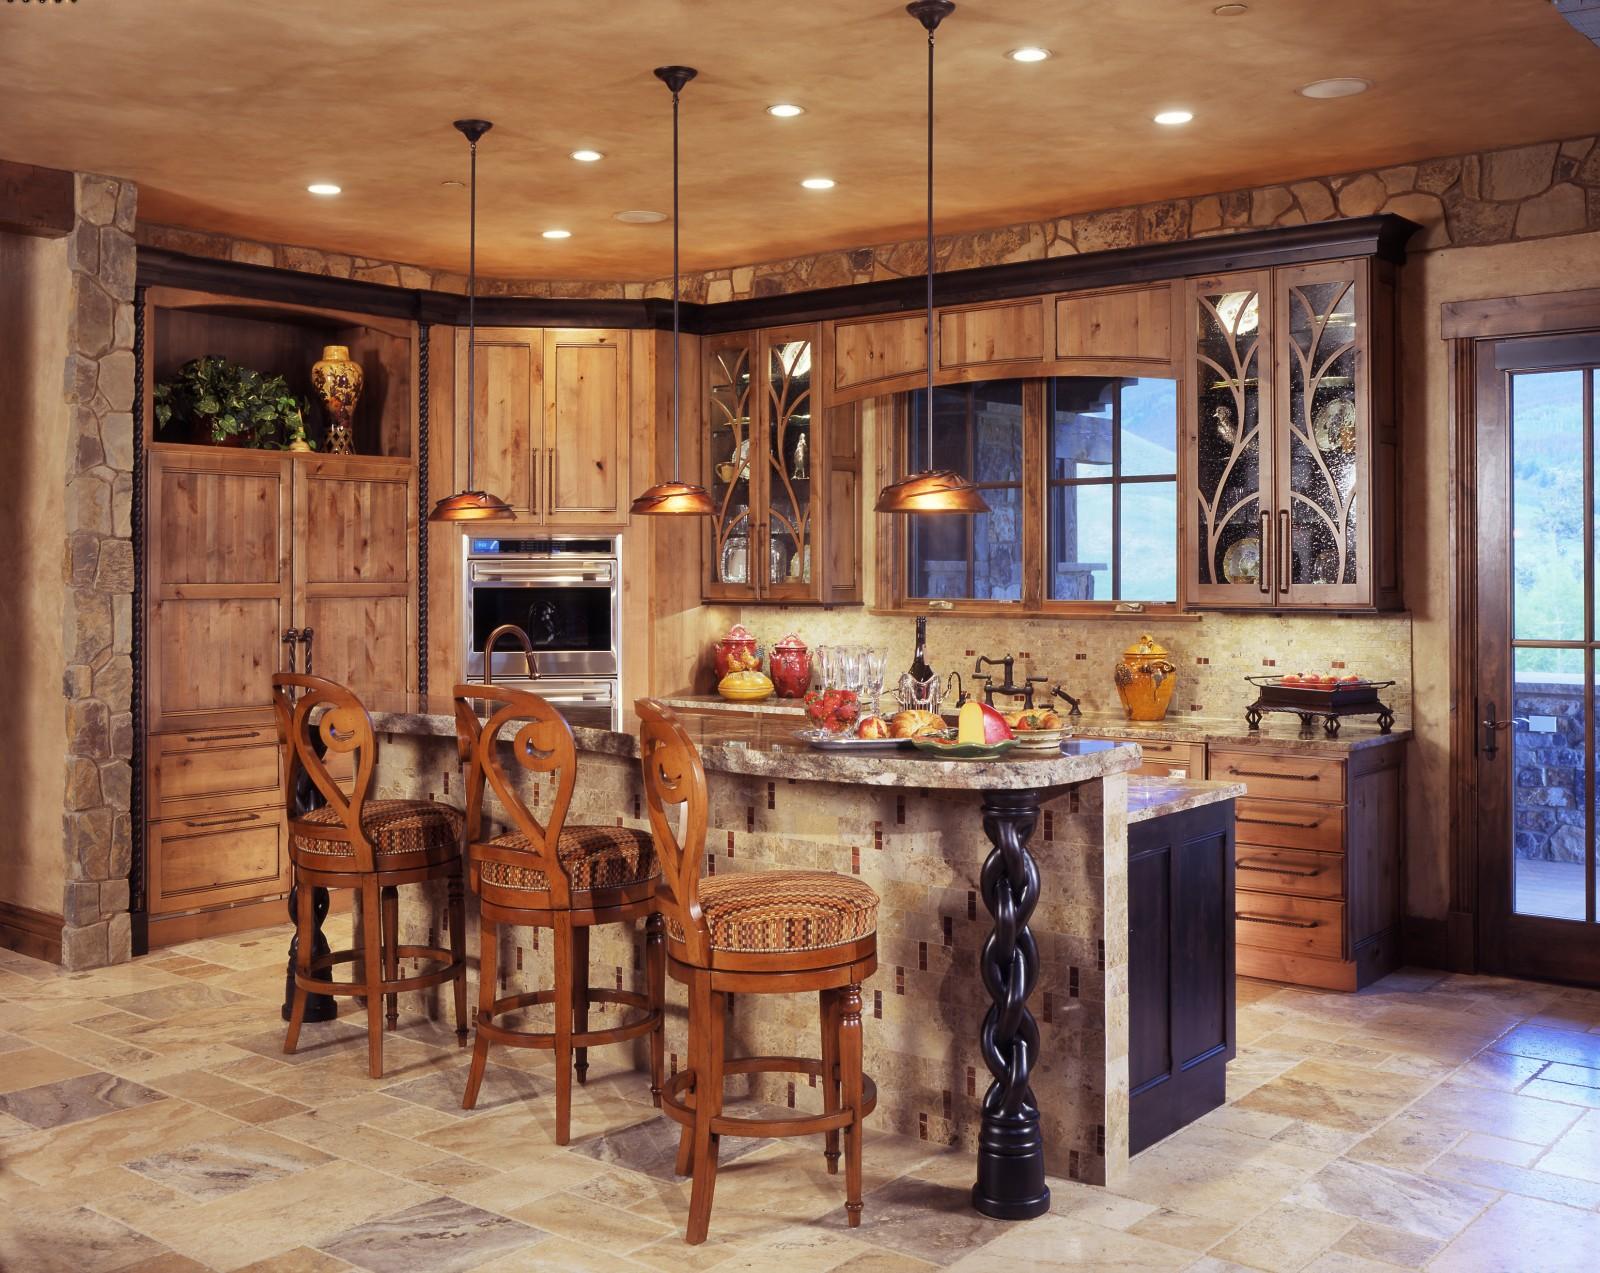 rustic-kitchen-decorating-ideas_